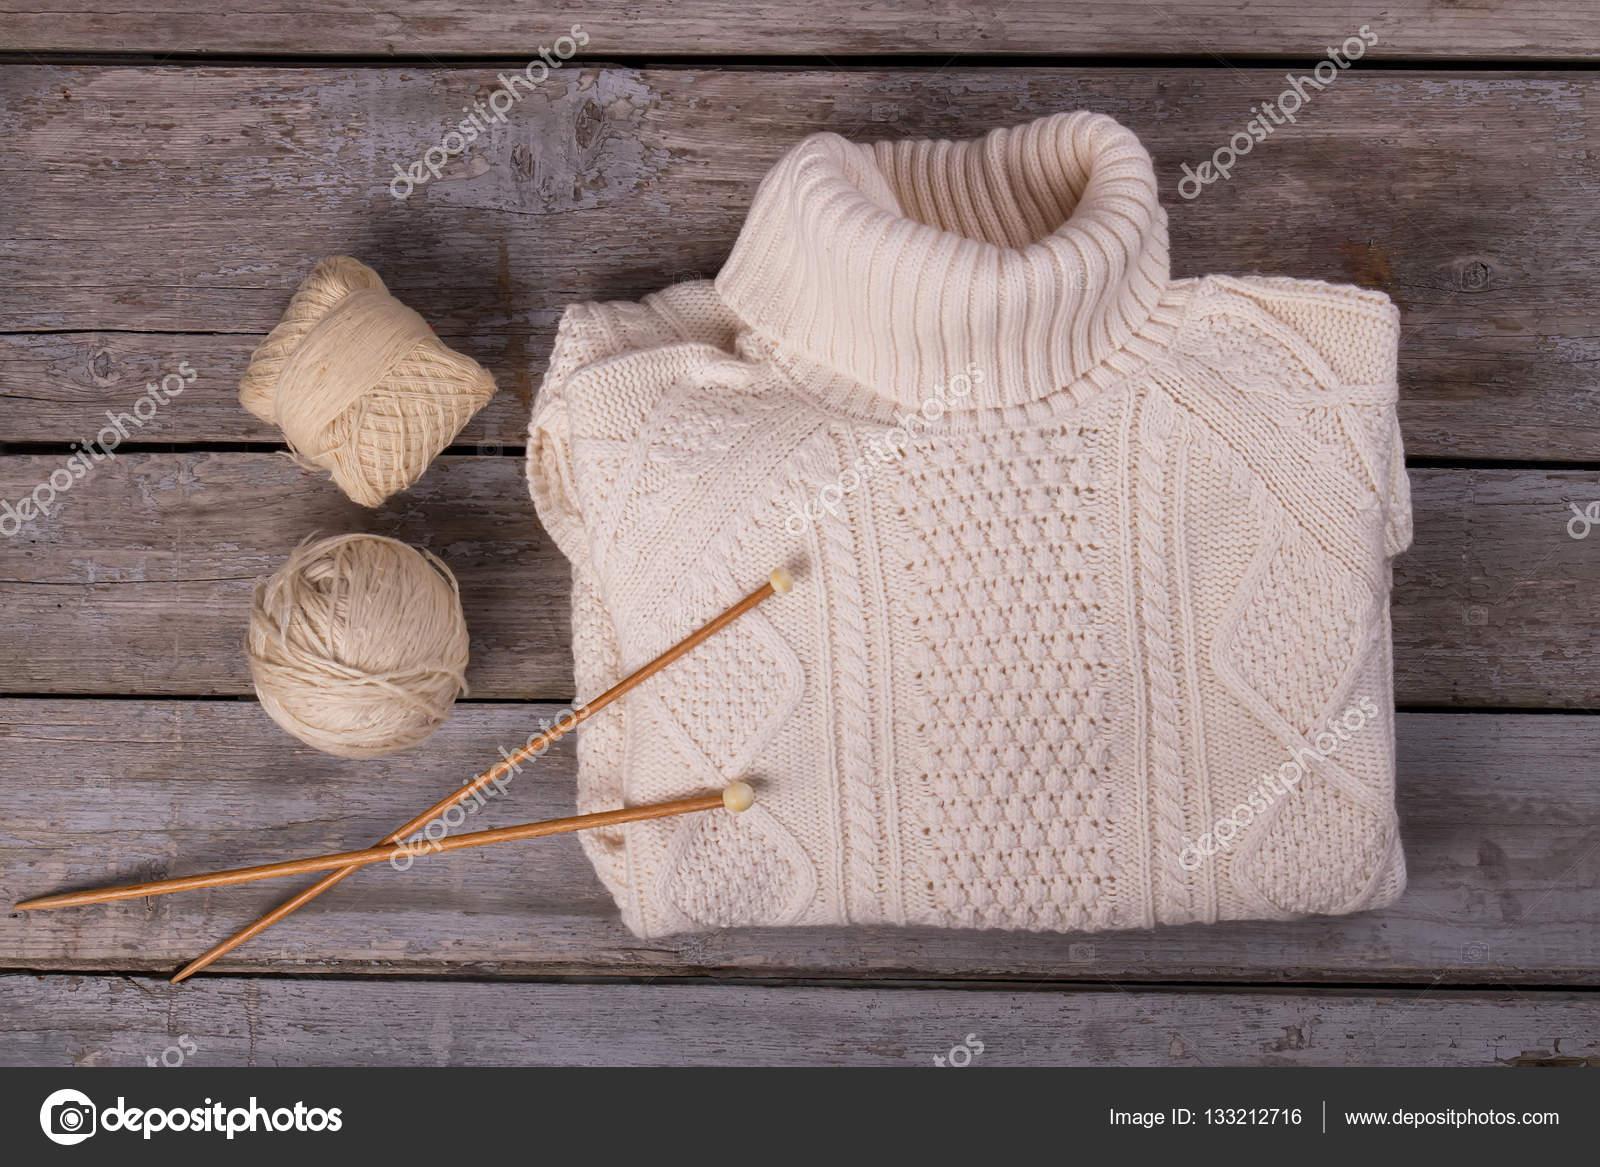 f4cc5f59cf90 ... φόντο ξύλινη — Φωτογραφία Αρχείου · Ζεστά πλεκτά πουλόβερ σε ένα ξύλινο  υπόβαθρο. Χειμώνας πουλόβερ με νήματα και βελόνες πλεξίματος.